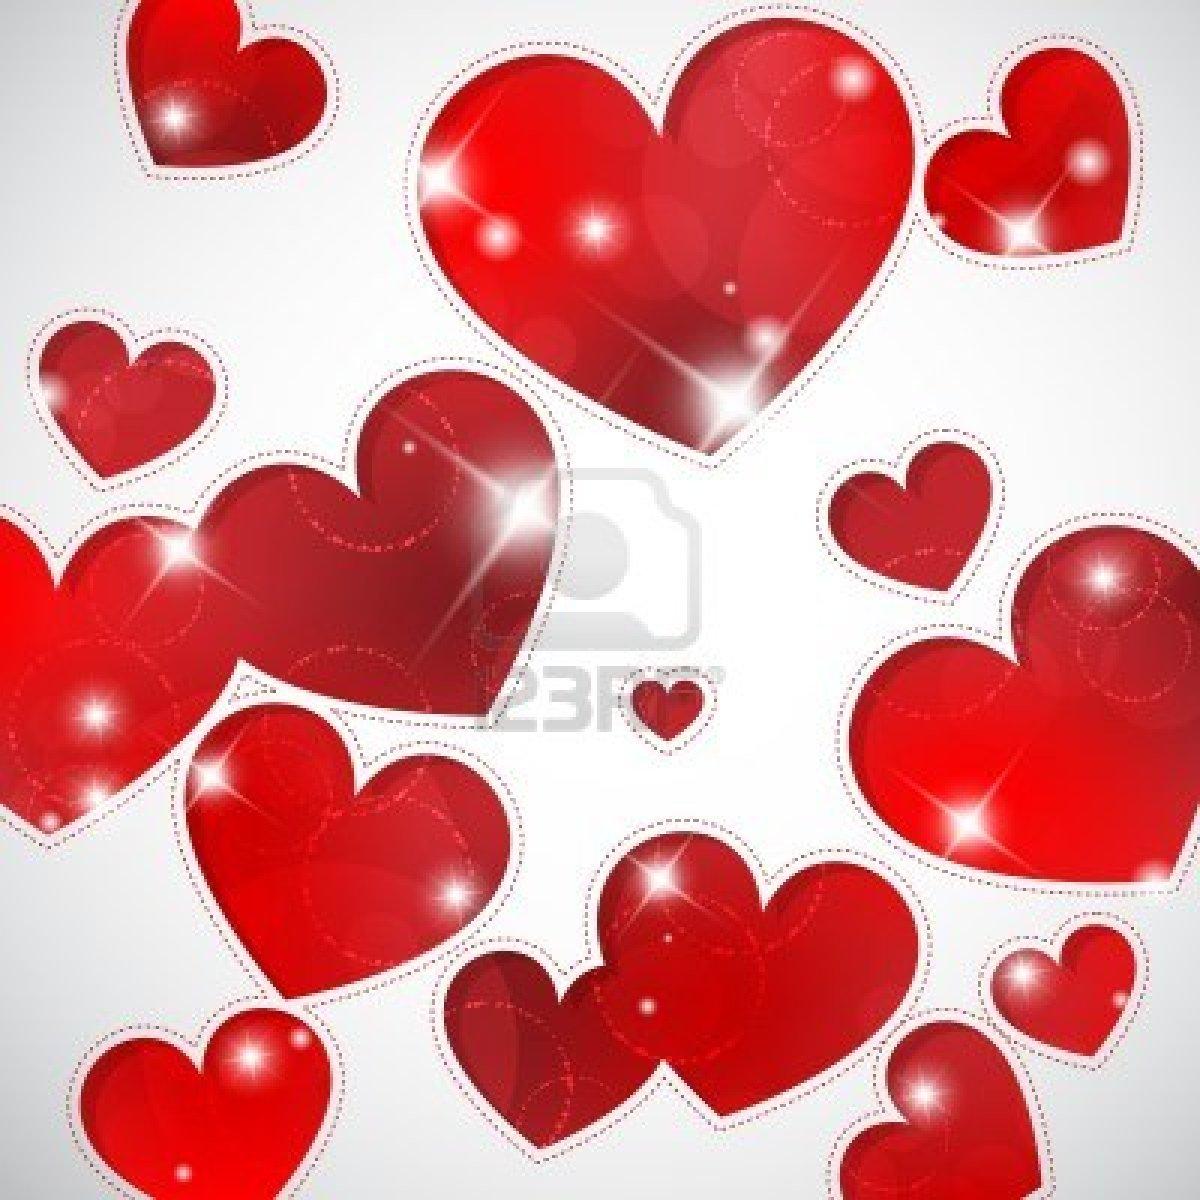 Pz c corazones - Corazones de san valentin ...